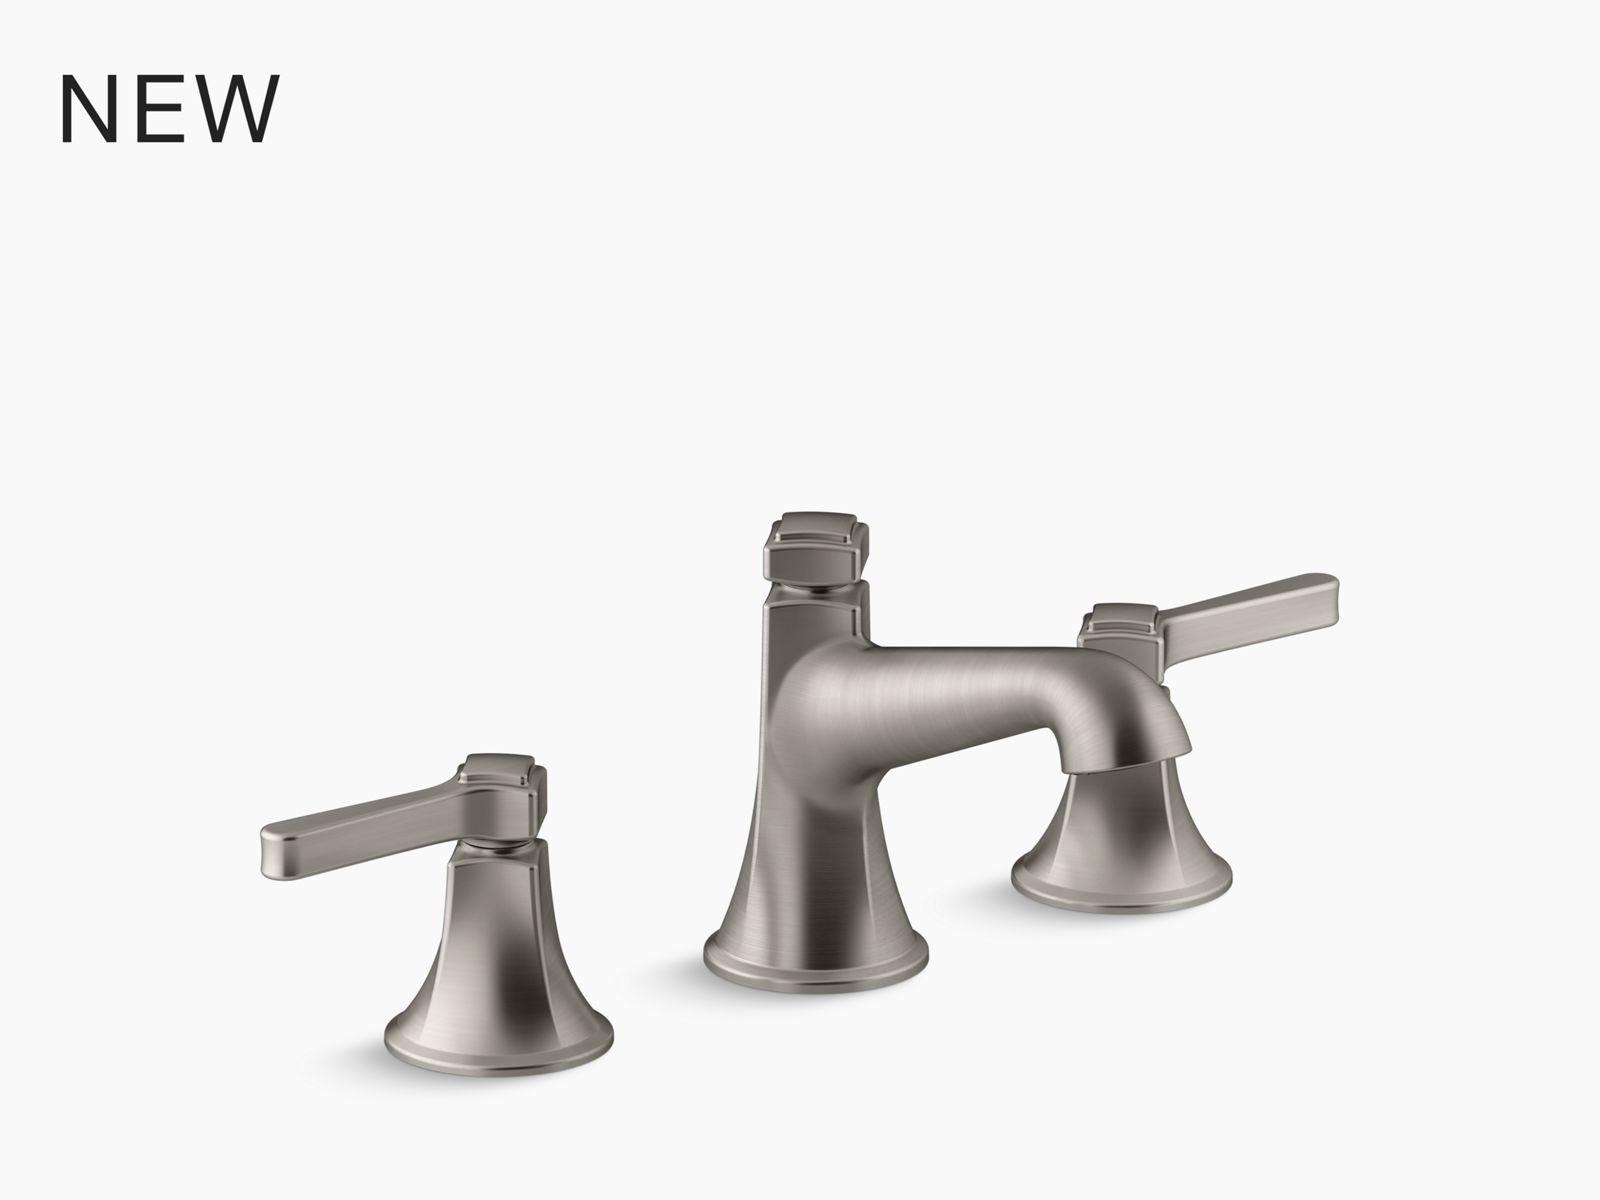 maxton single handle bathroom sink faucet